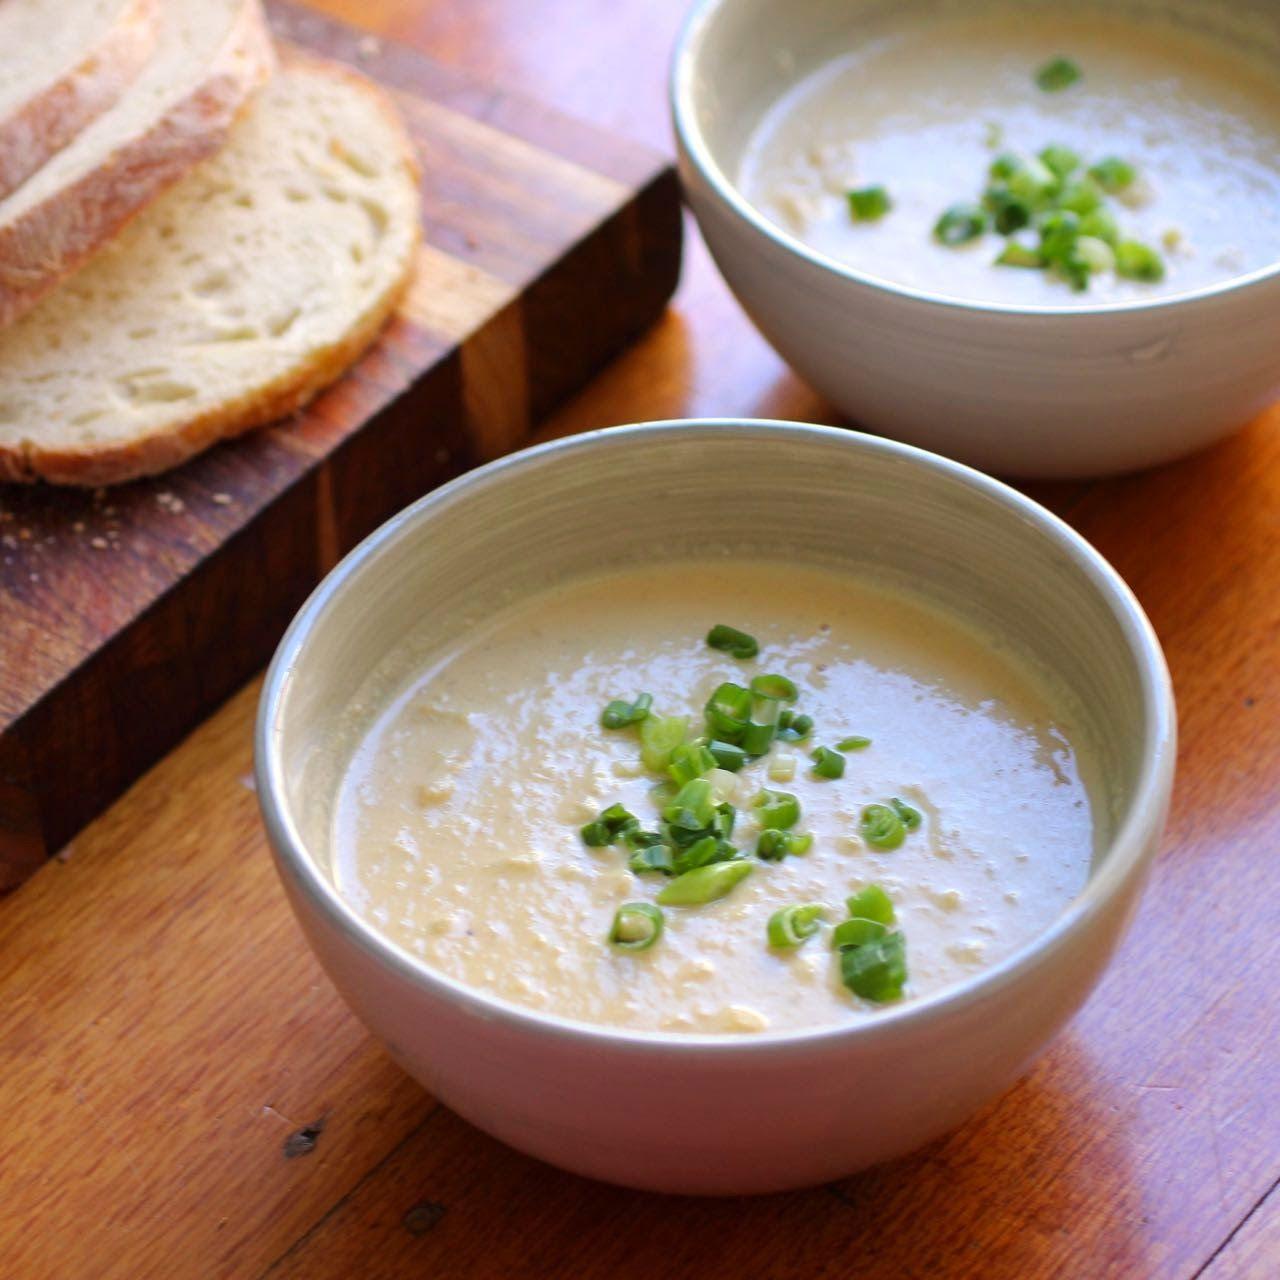 Green Gourmet Giraffe: Cheesy cauliflower and rice soup (vegan)